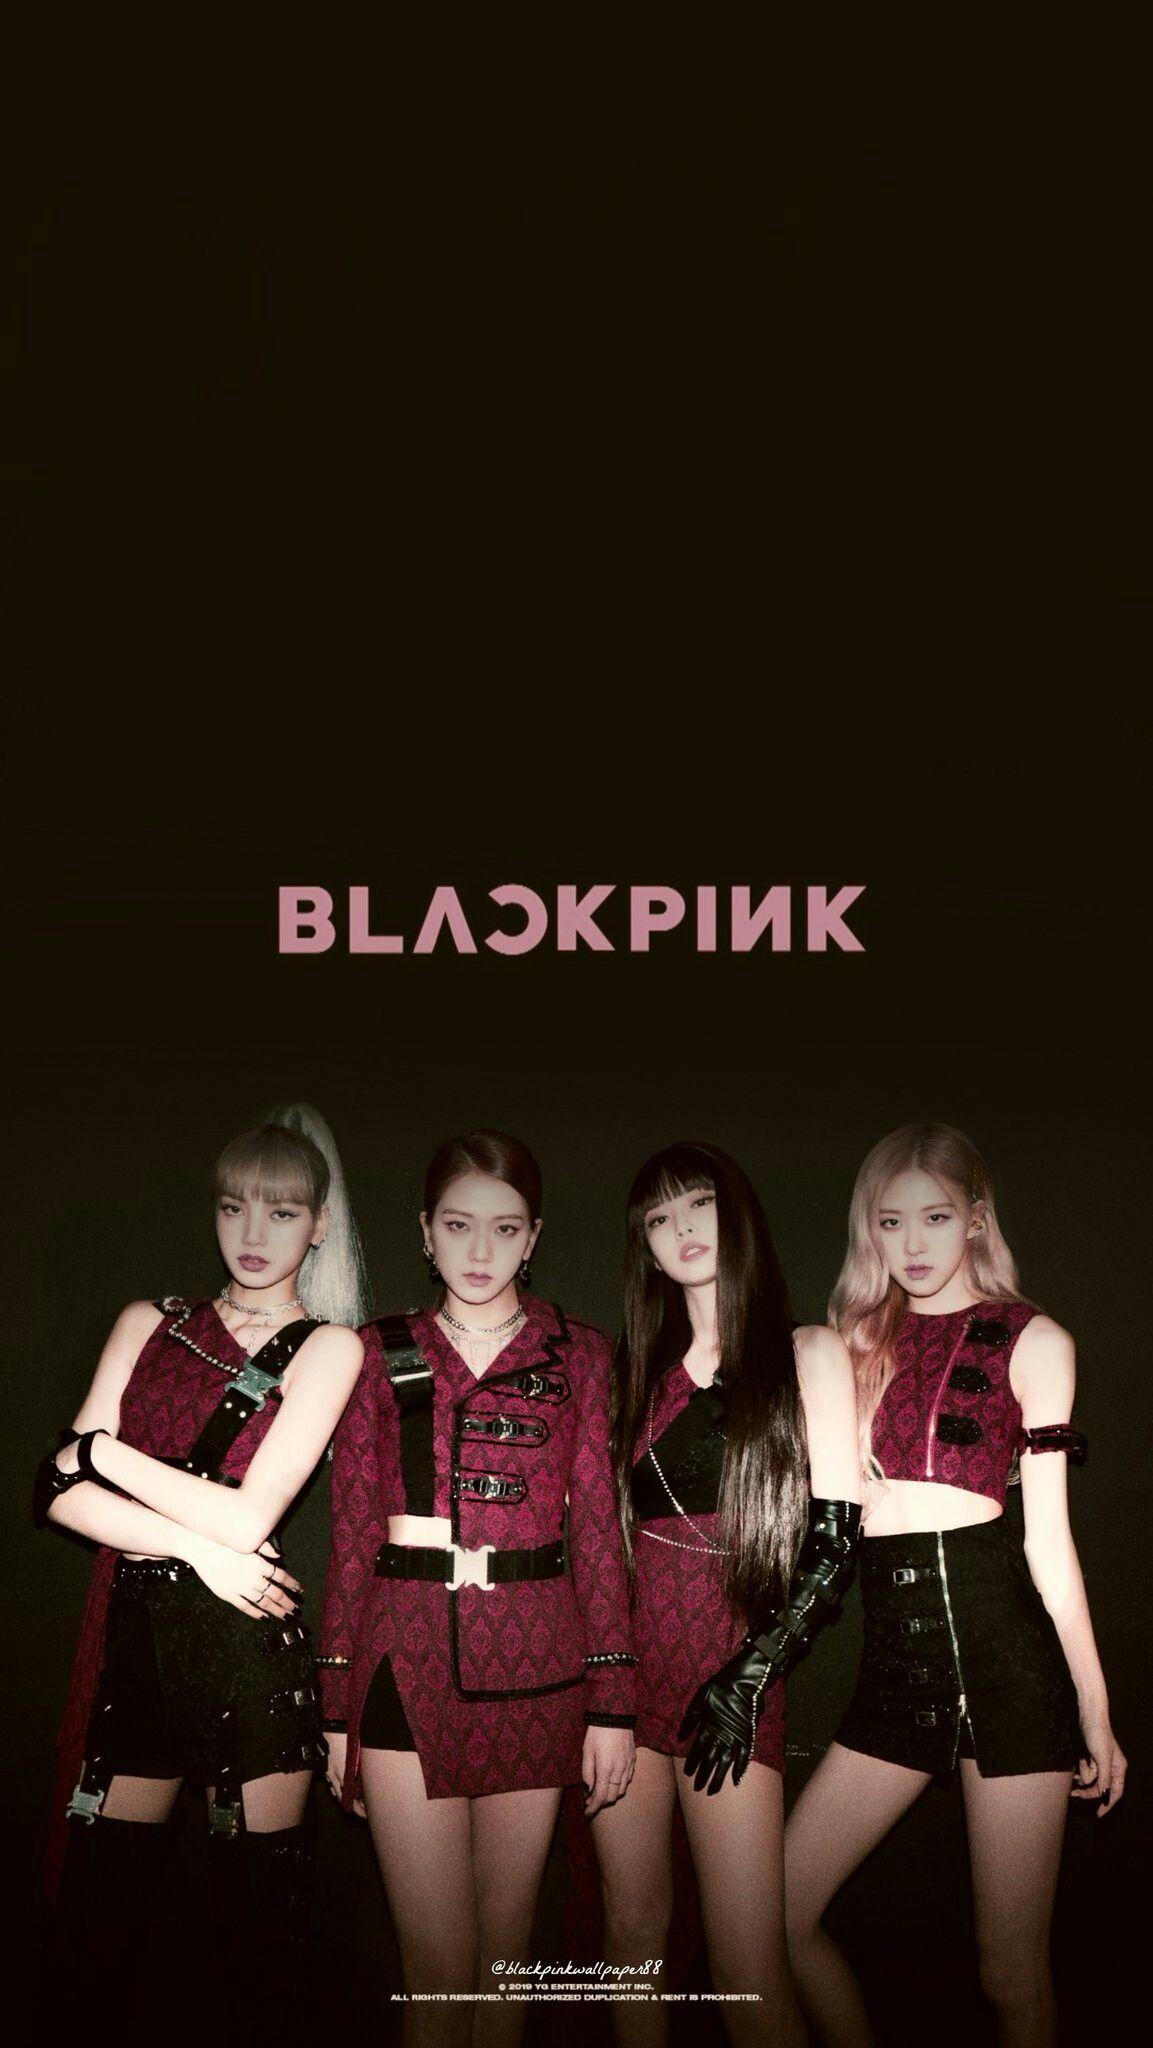 Blackpink Kill This Love 2019 Comeback Jennie Lisa Rose Jisoo Wallpaper Lockscreen Fondo De Pantalla H Blackpink Black Pink Kpop Lisa Blackpink Wallpaper